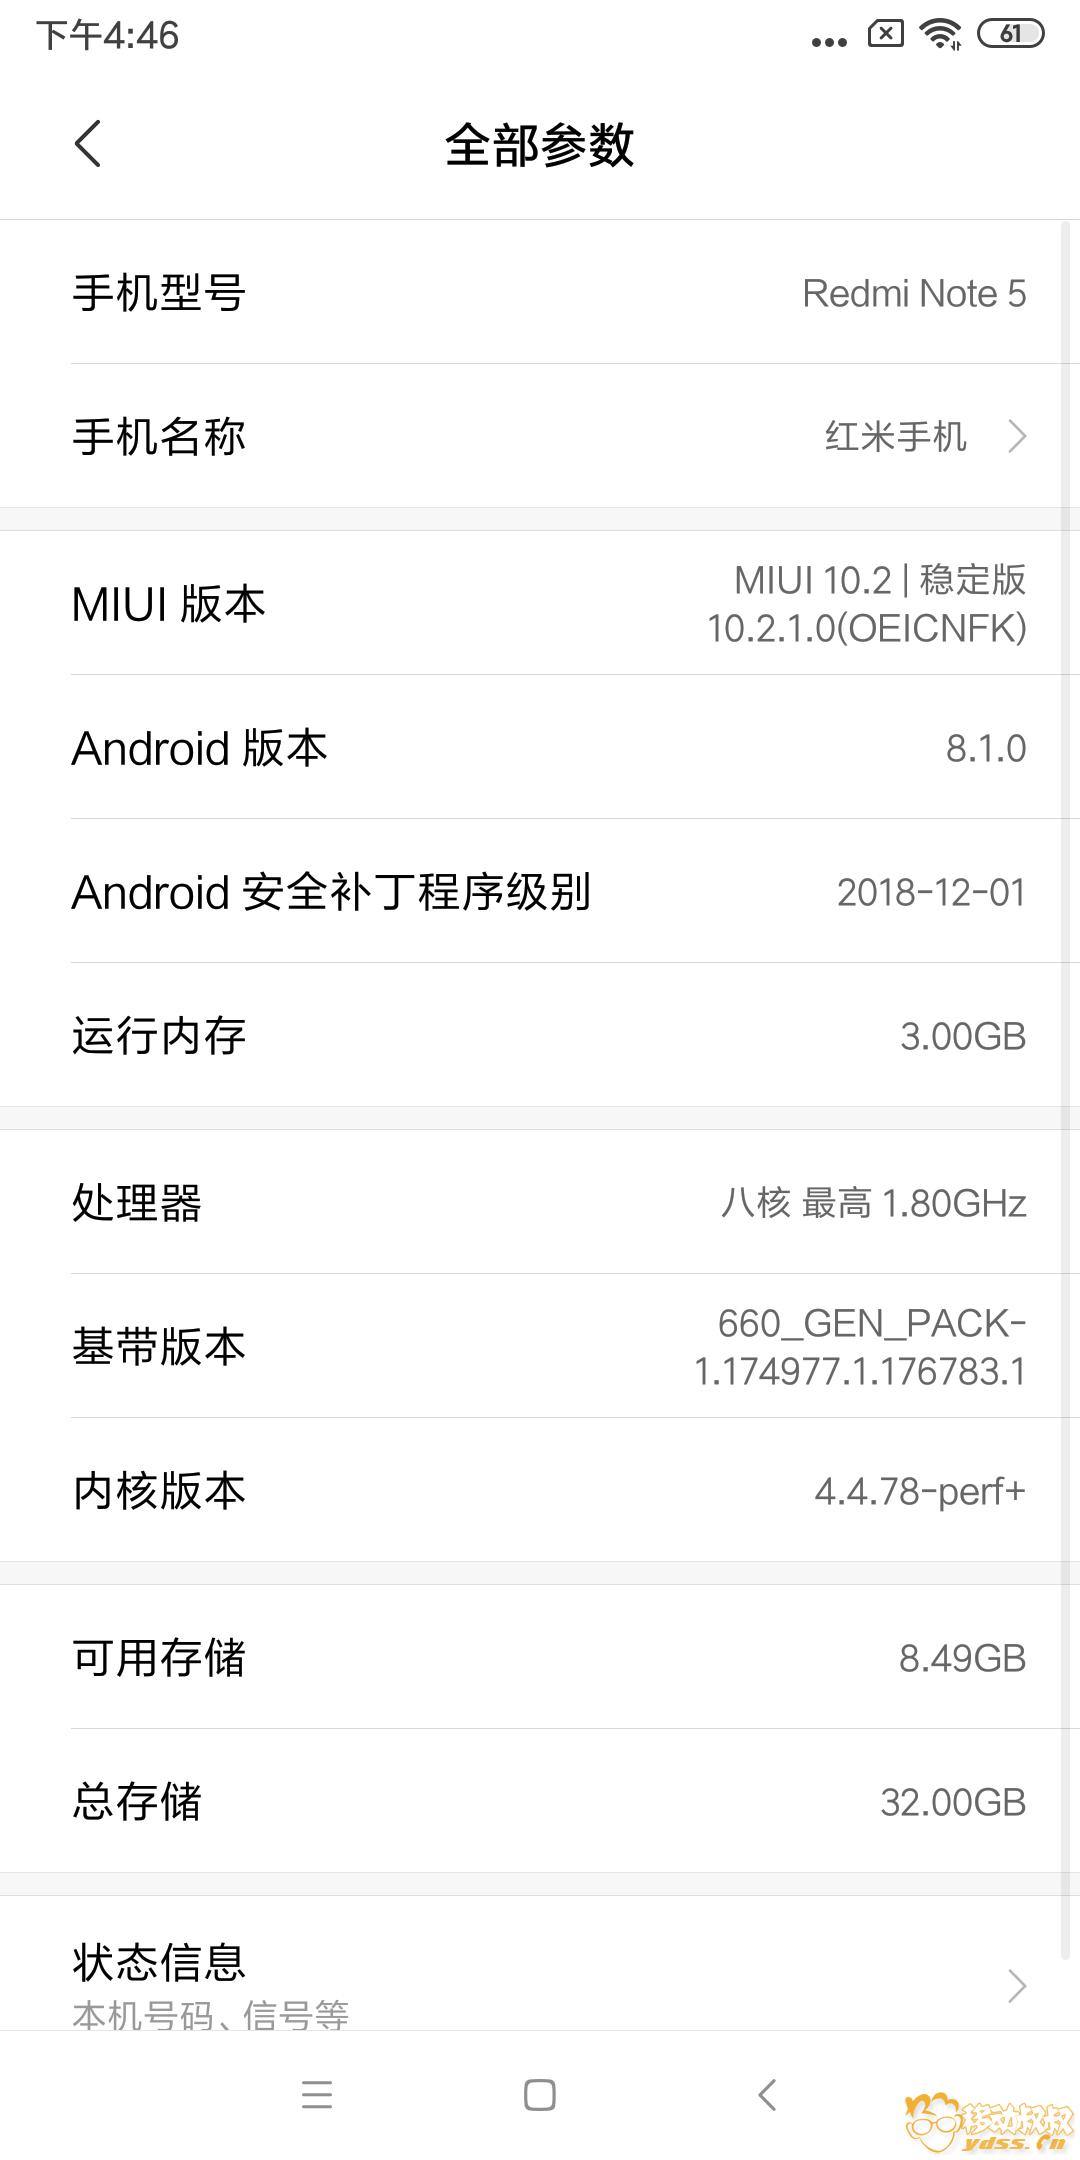 Screenshot_2019-01-10-16-46-14-019_com.android.settings.png